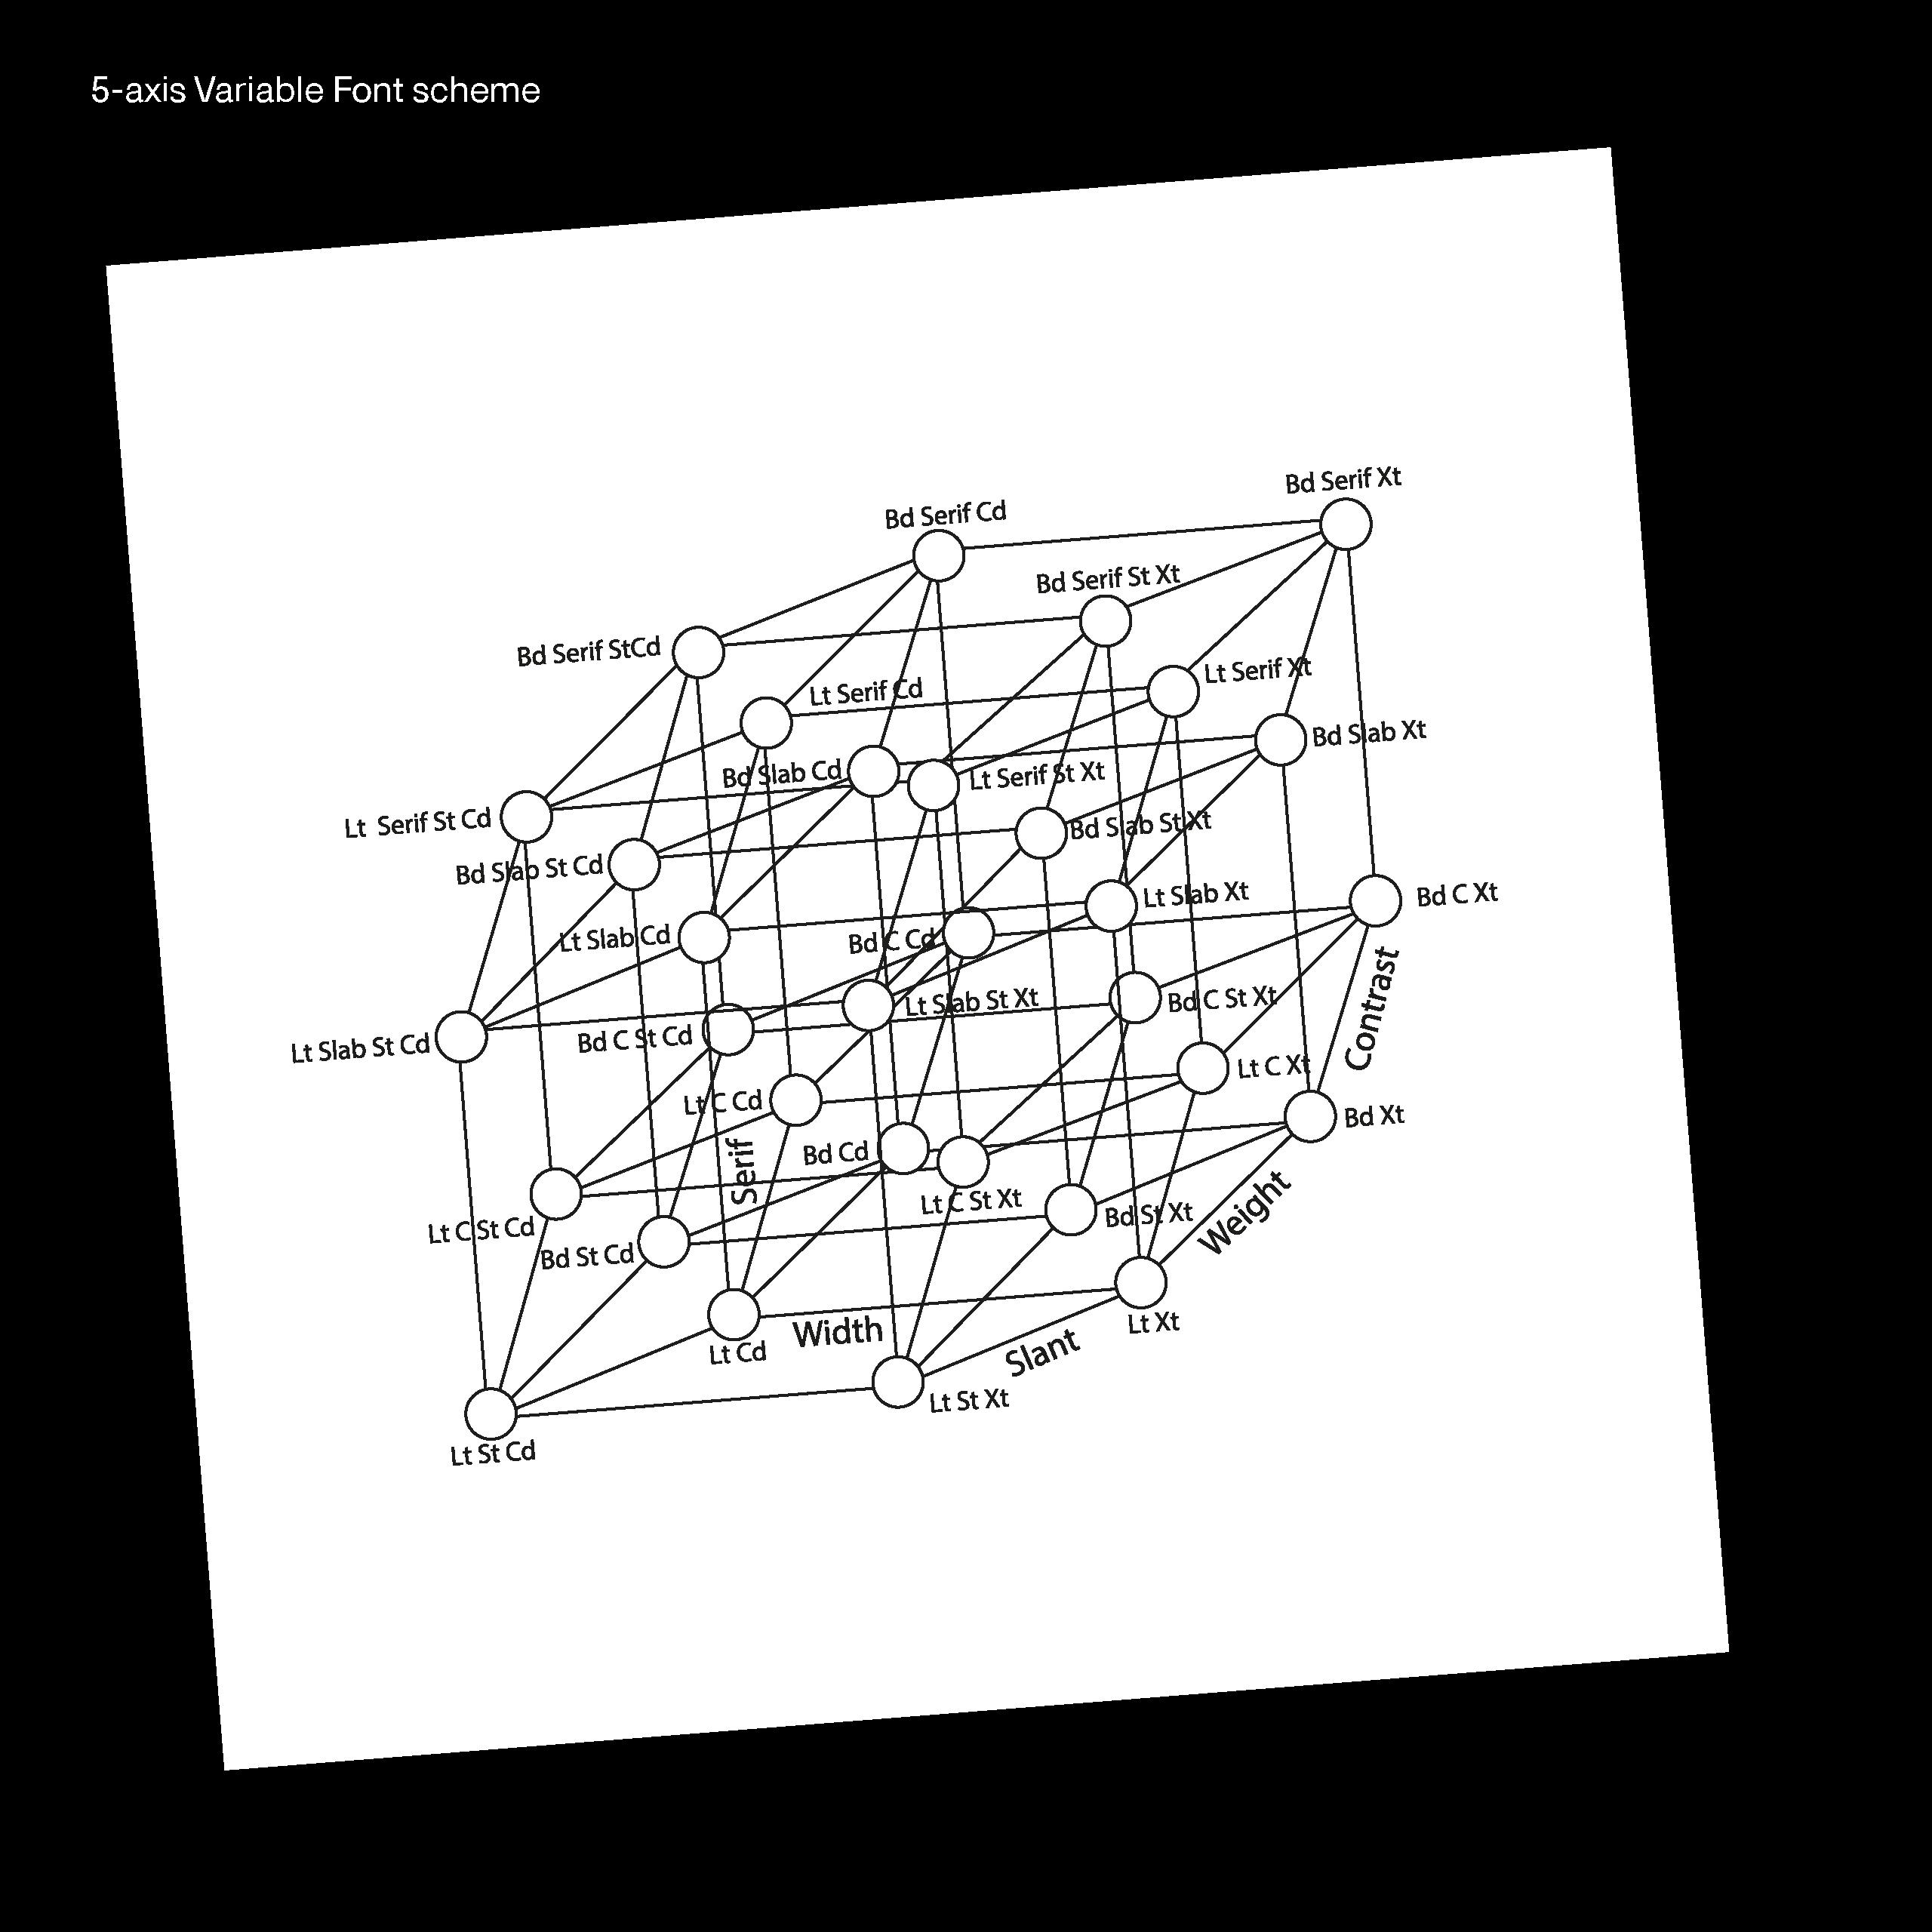 Daniel_Stuhlpfarrer_Spekulative-Schriftgestaltung-Speculative-Type-Design_WEB36